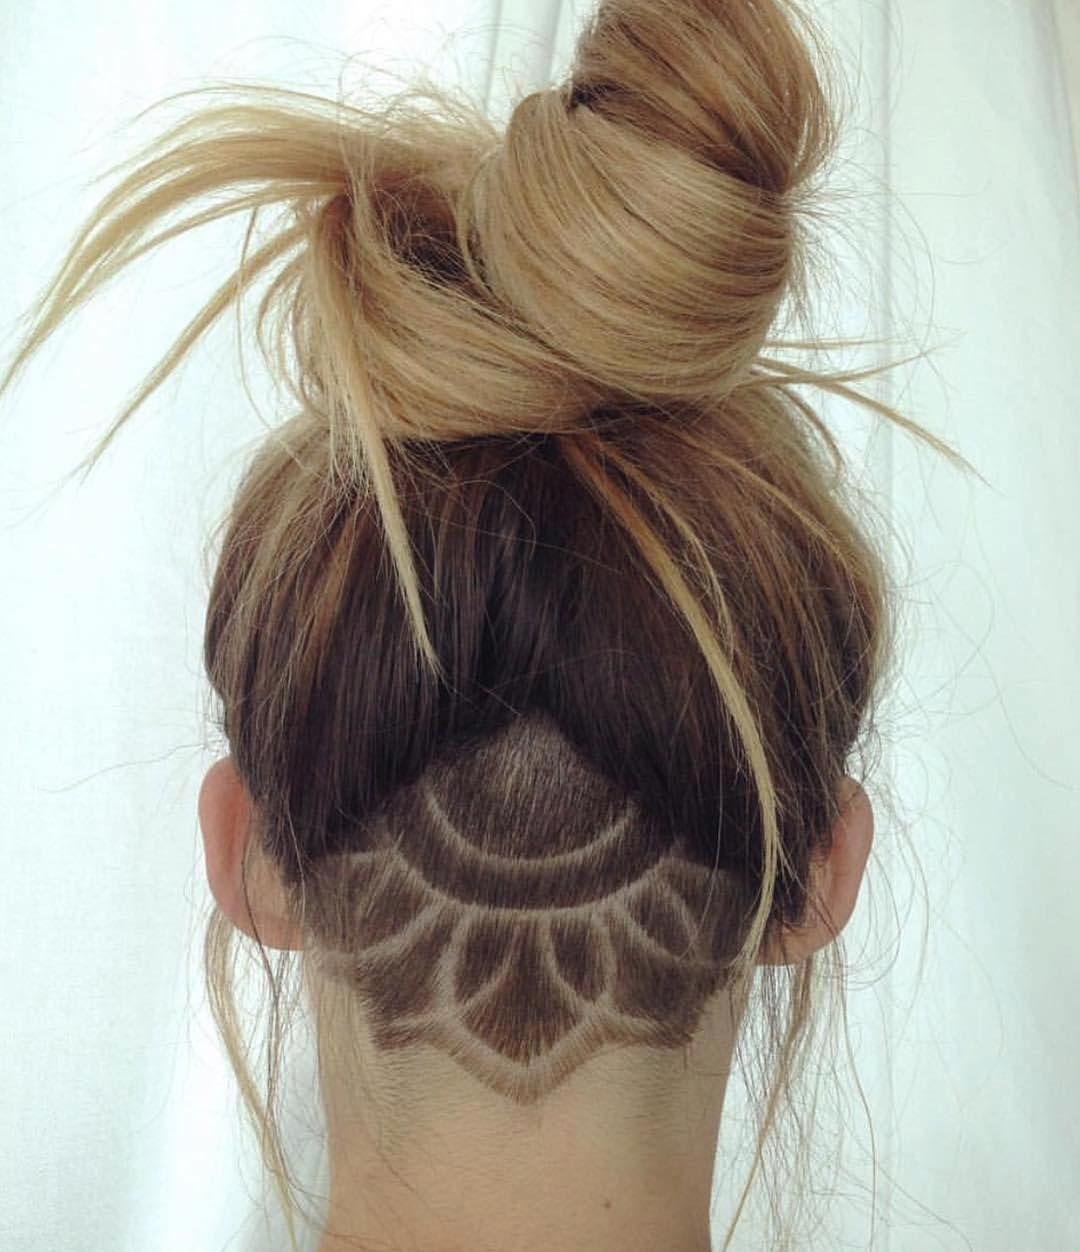 minnah1999 hairstyles pinterest frisur haar und haar ideen. Black Bedroom Furniture Sets. Home Design Ideas